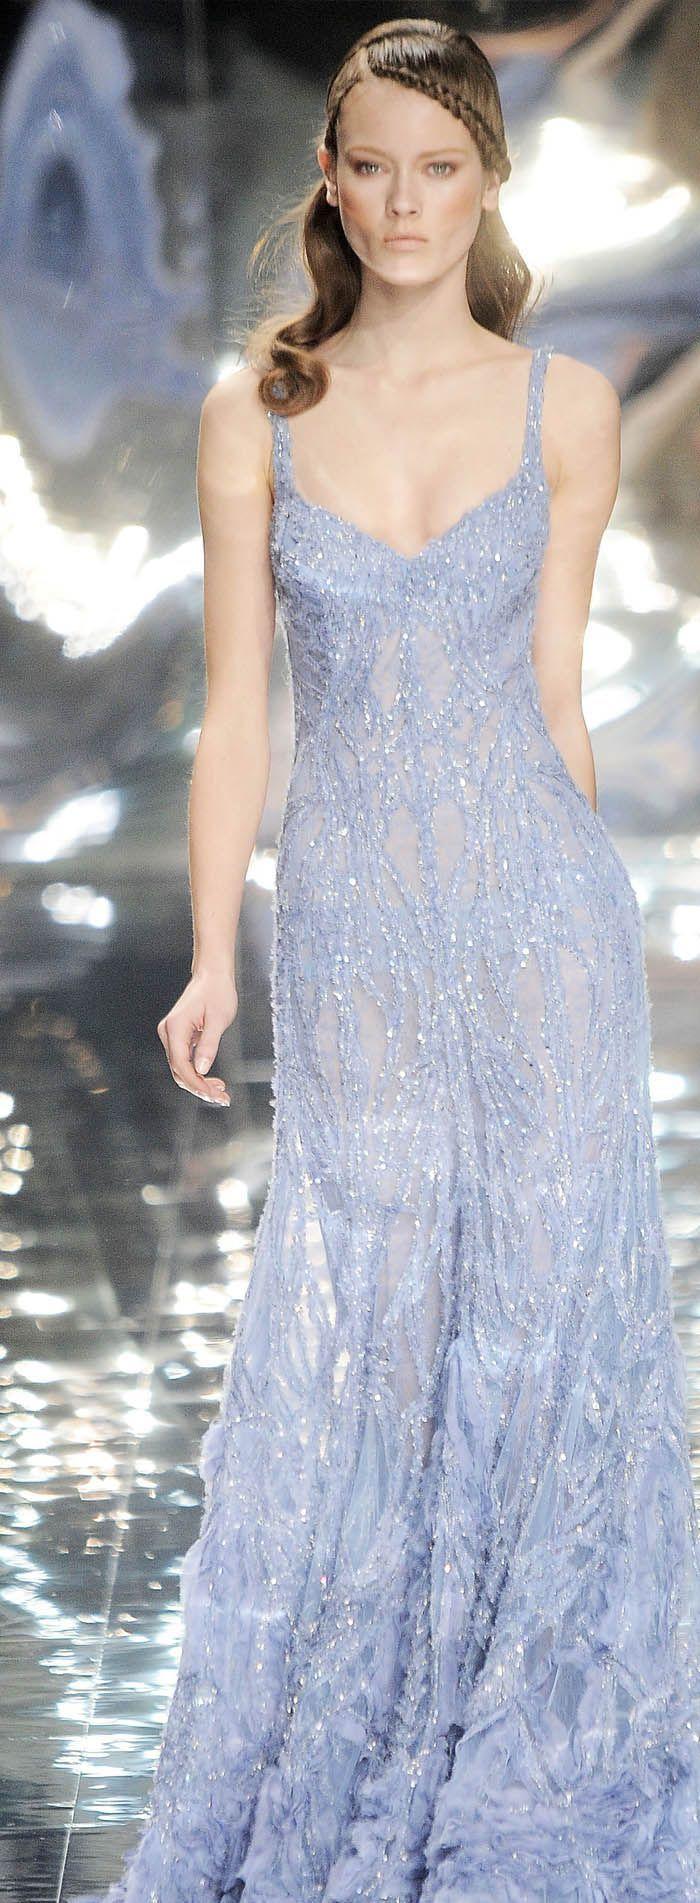 I really like this dress.